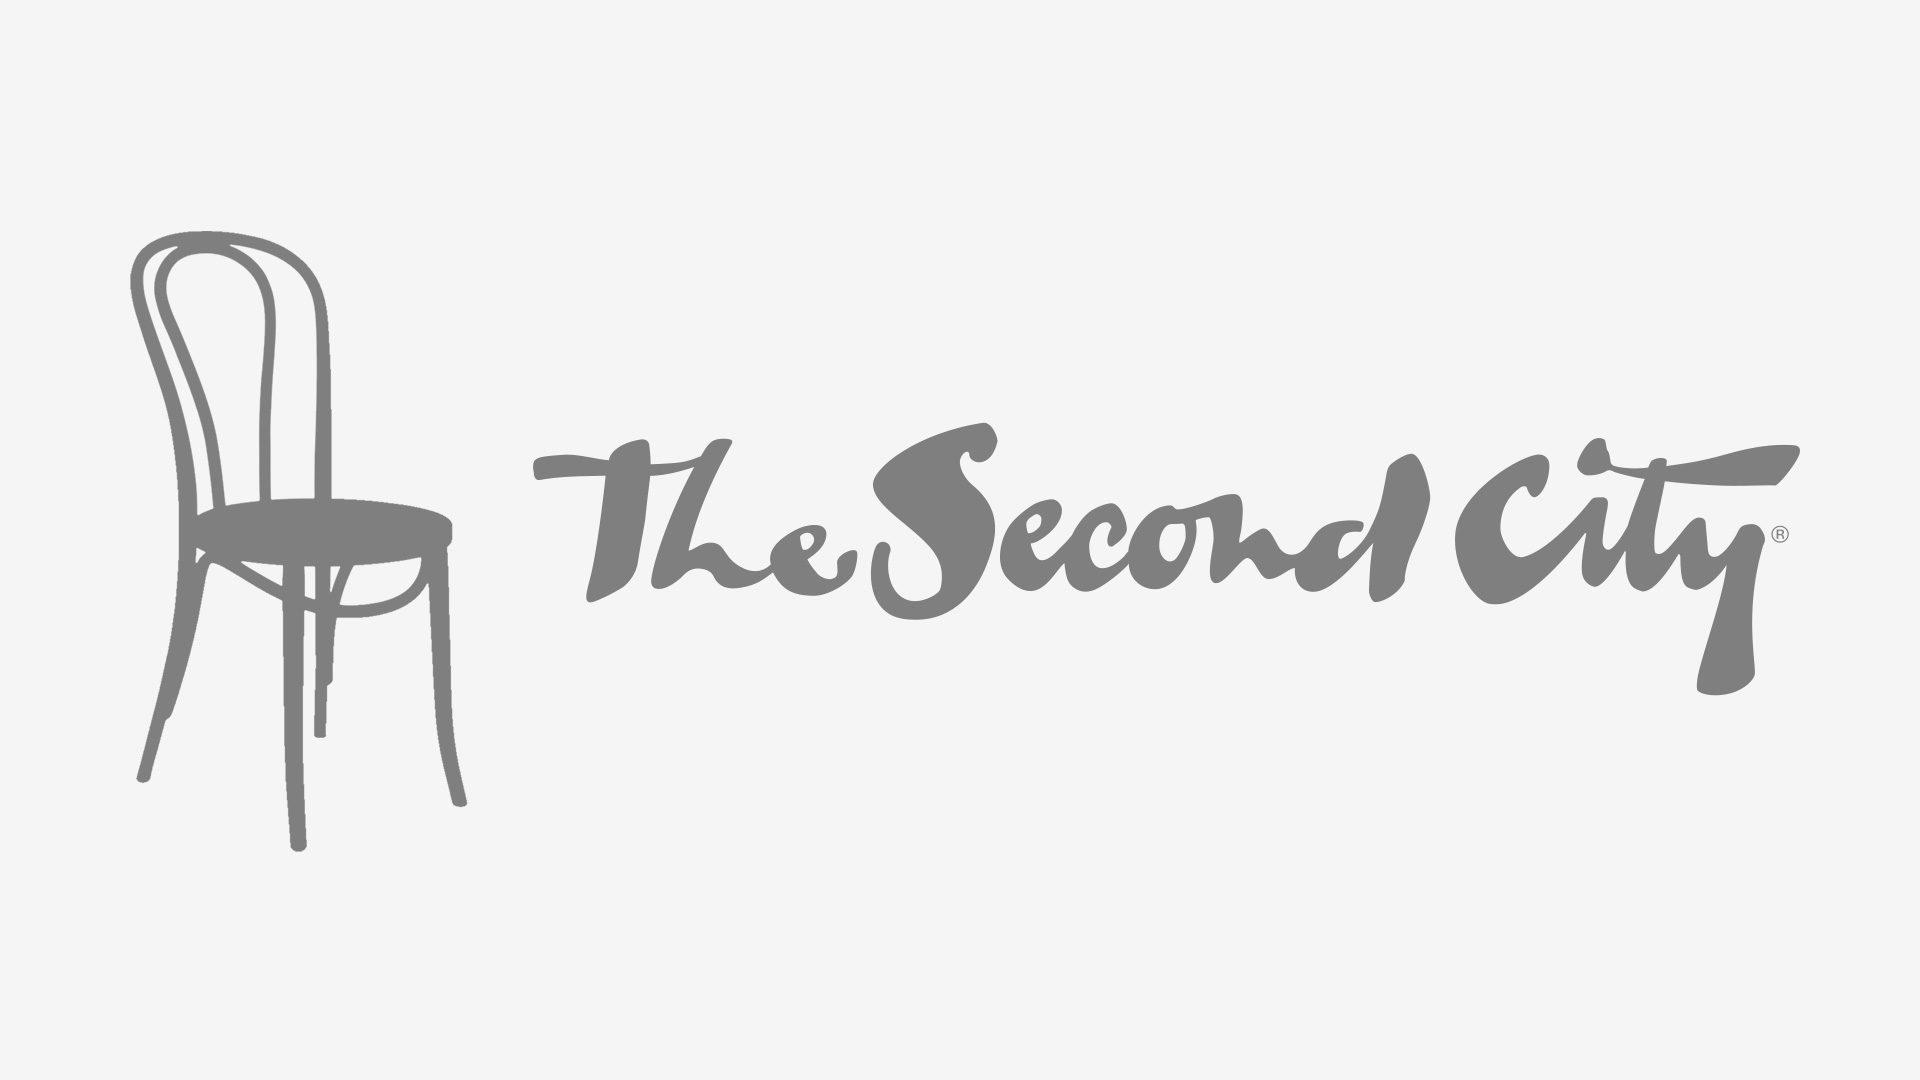 secondcity_placeholder